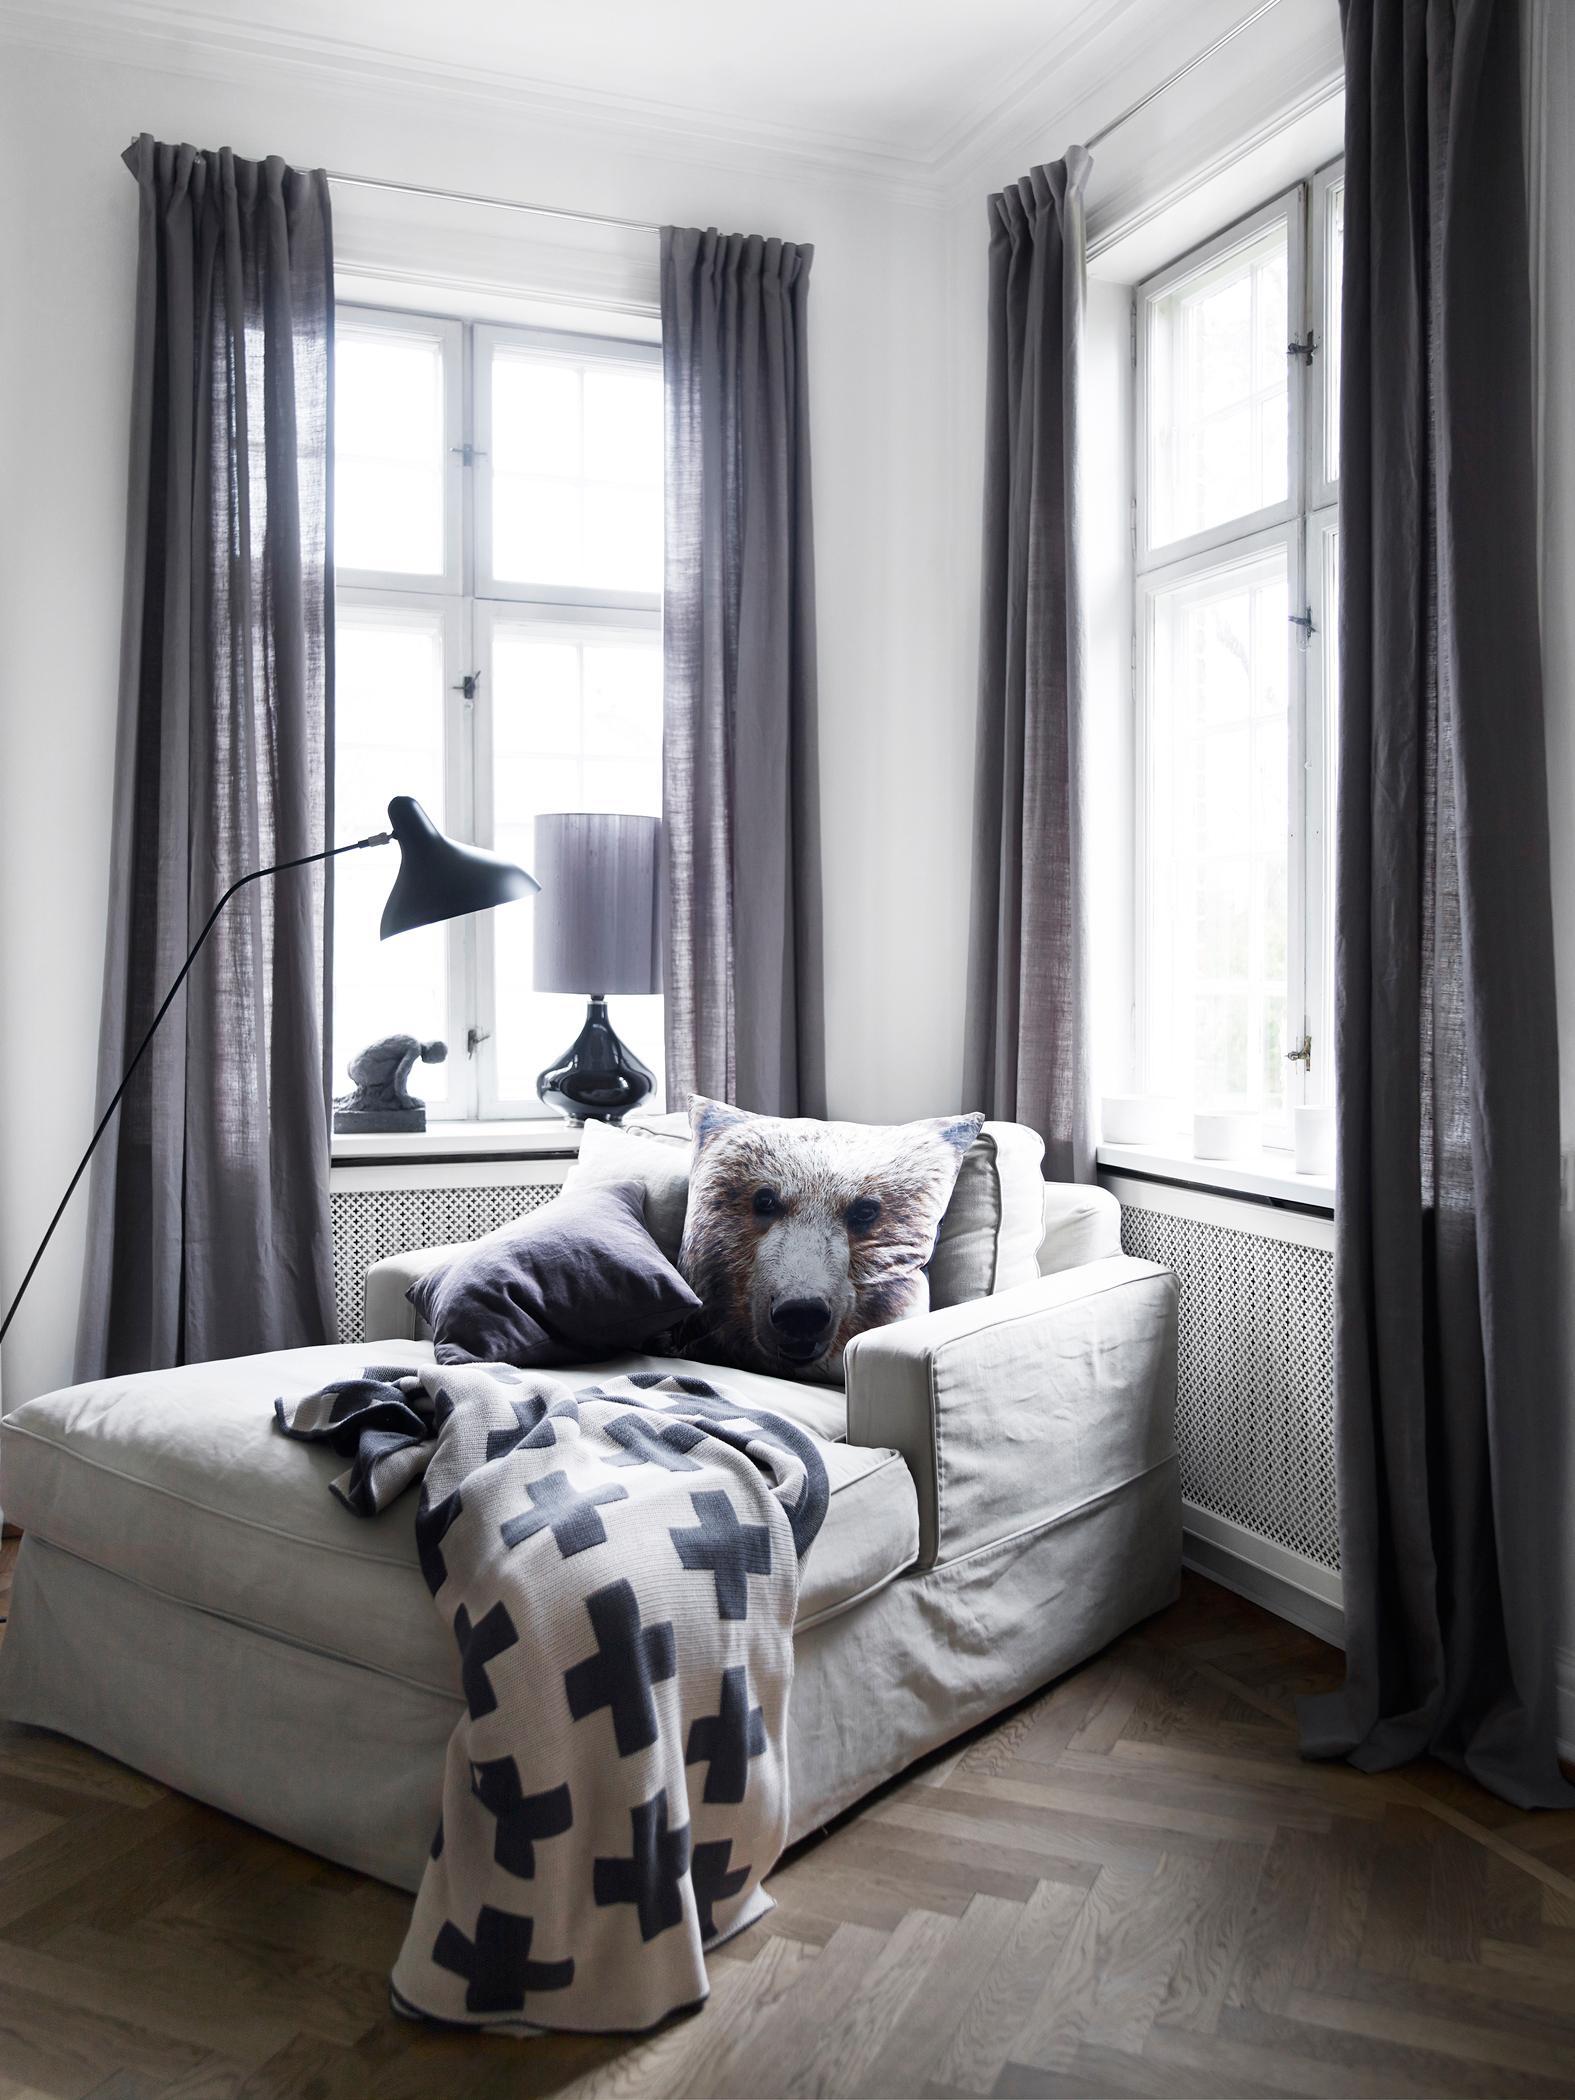 Hohe Fenster • Bilder & Ideen • COUCH